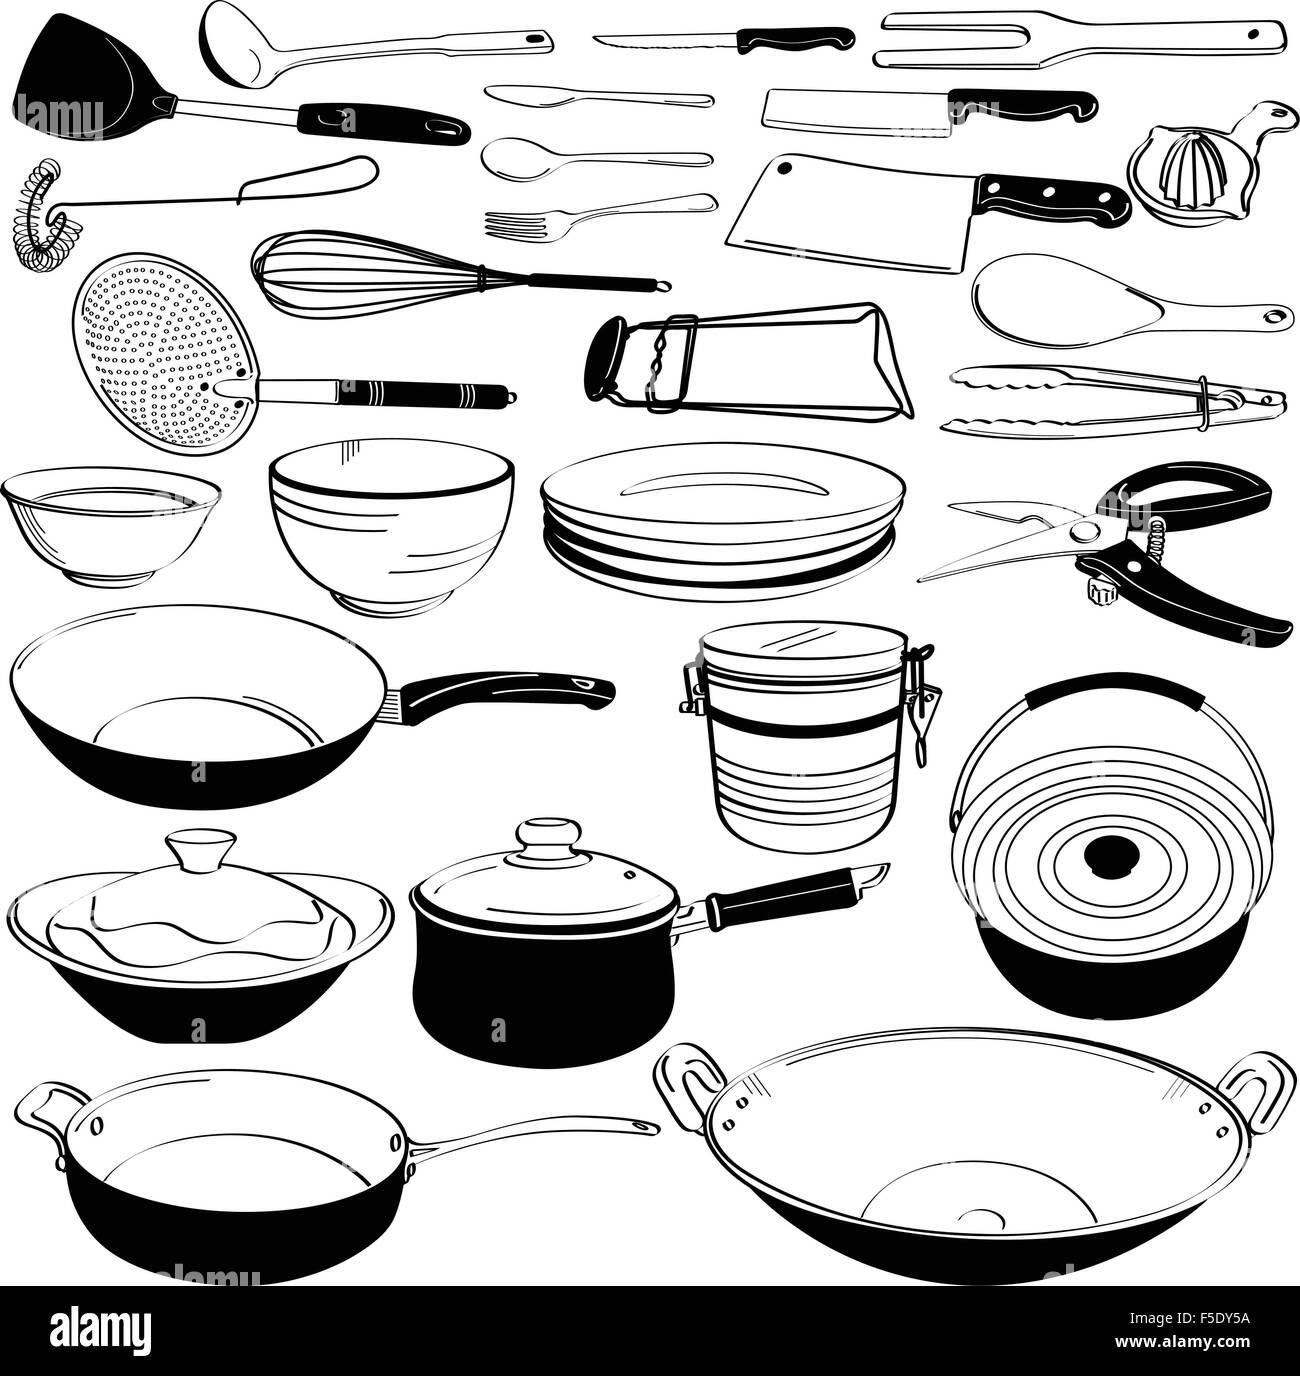 Kitchen Tool Utensil Equipment Doodle Drawing Sketch Stock Vector ...